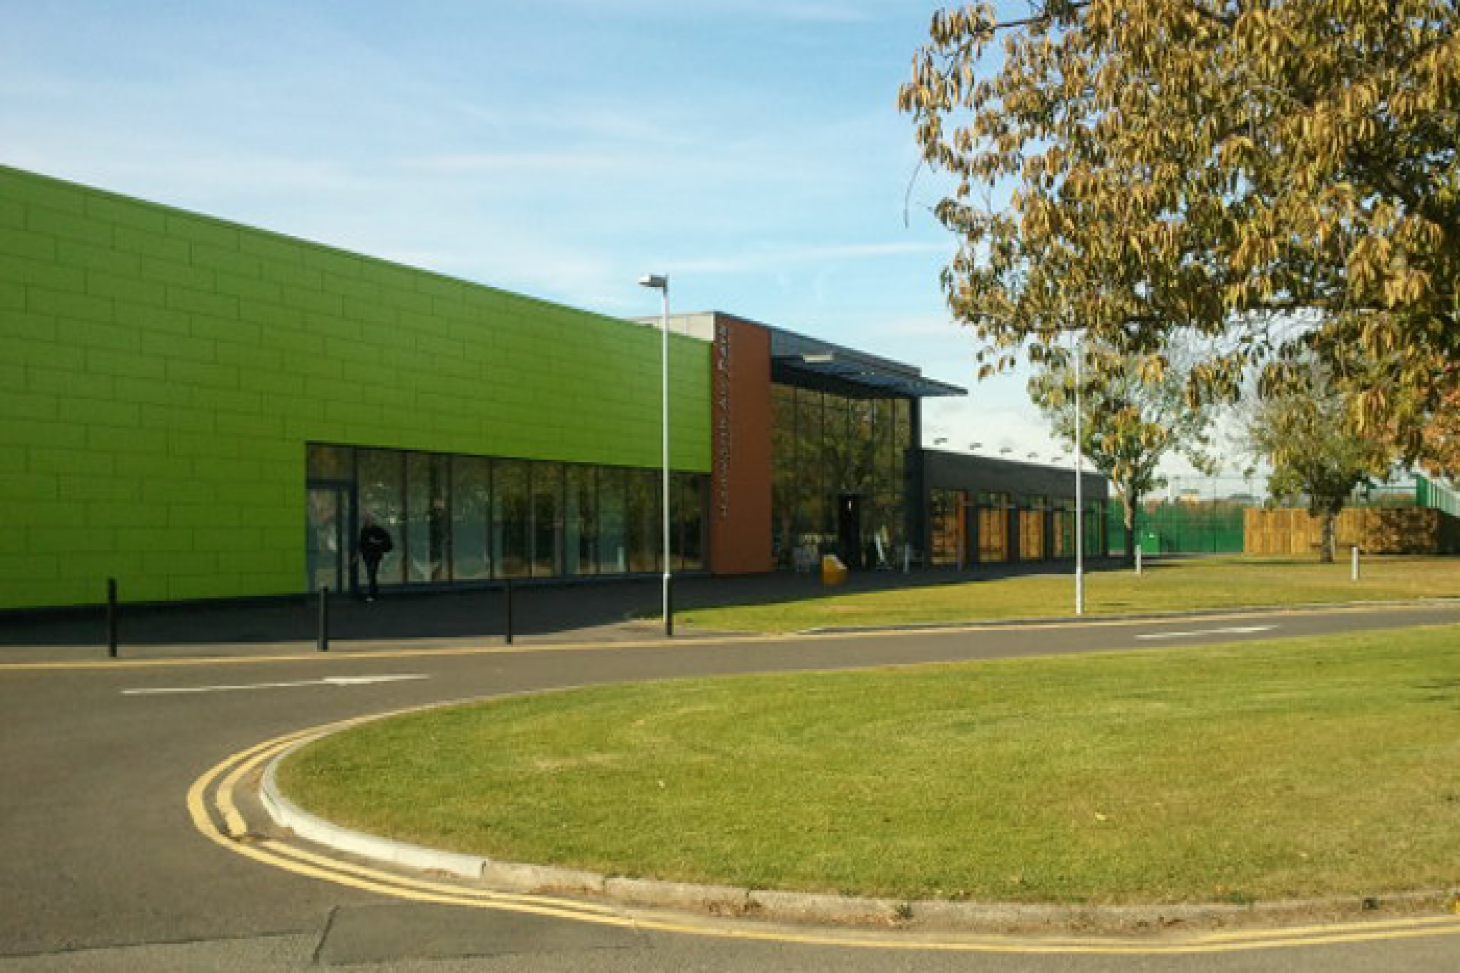 Hanworth Air Park Leisure Centre Indoor swimming pool